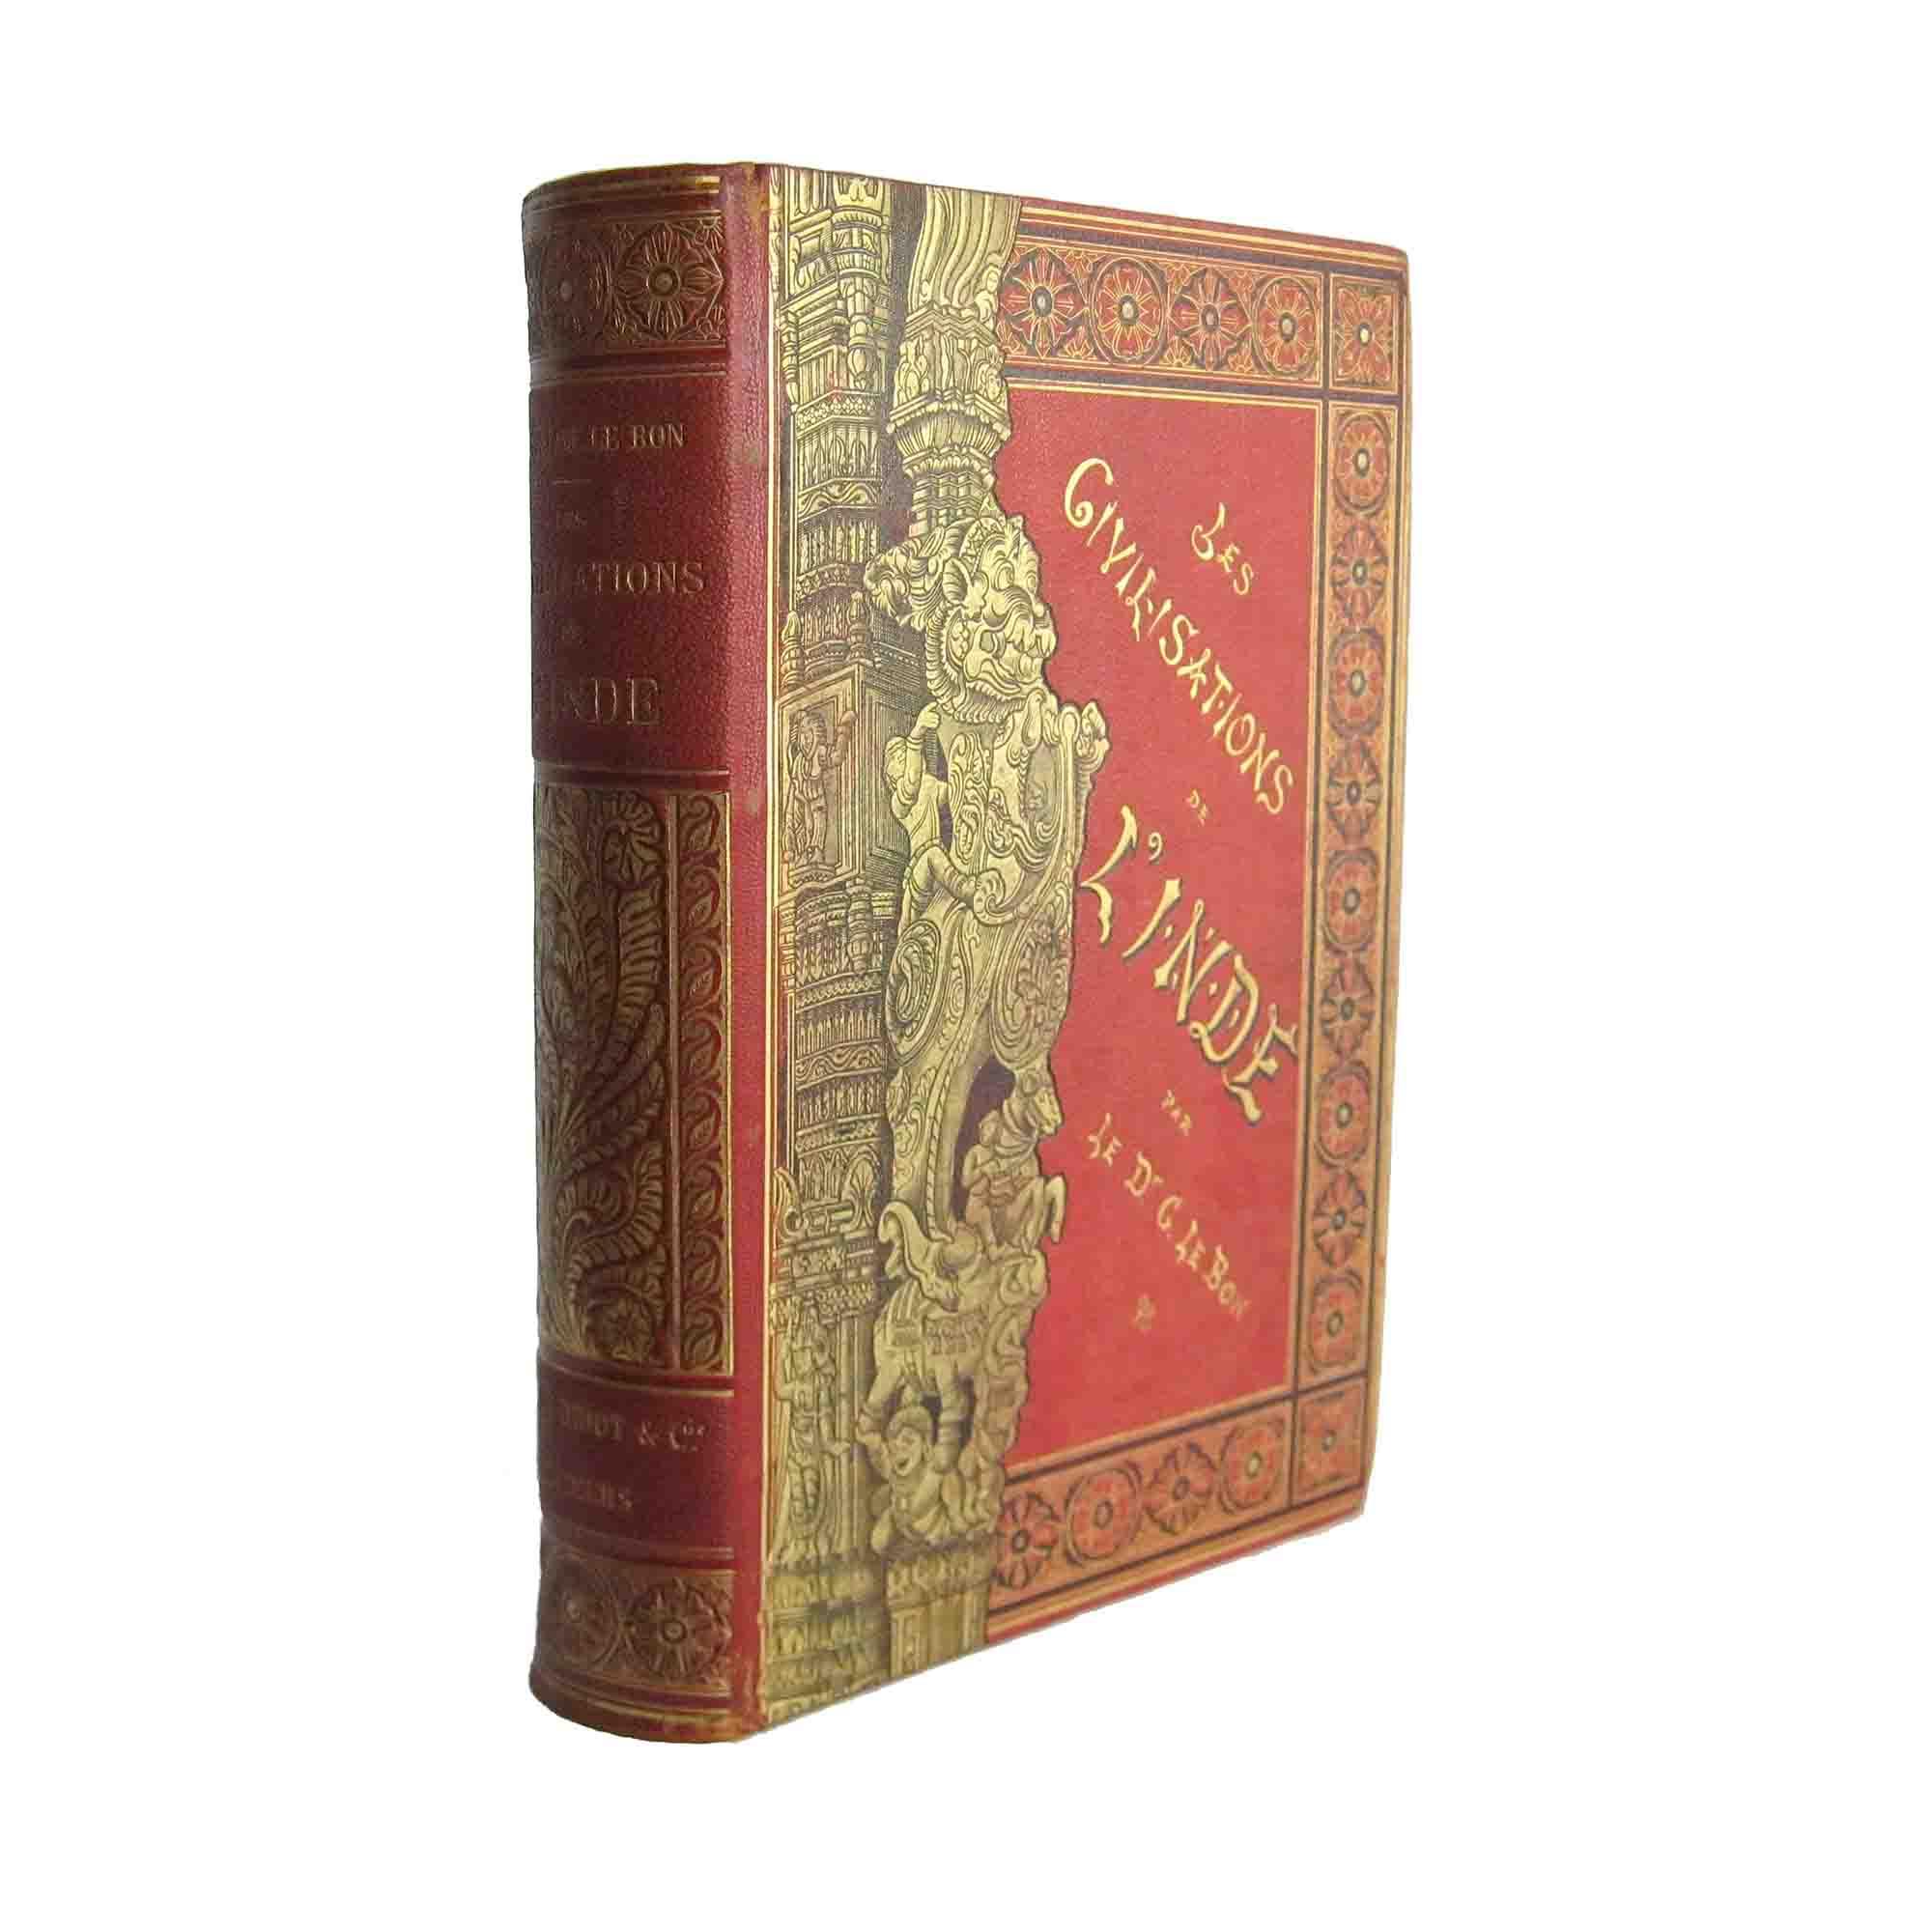 5261-Le-Bon-Inde-1887-Einband-frei-N.jpeg